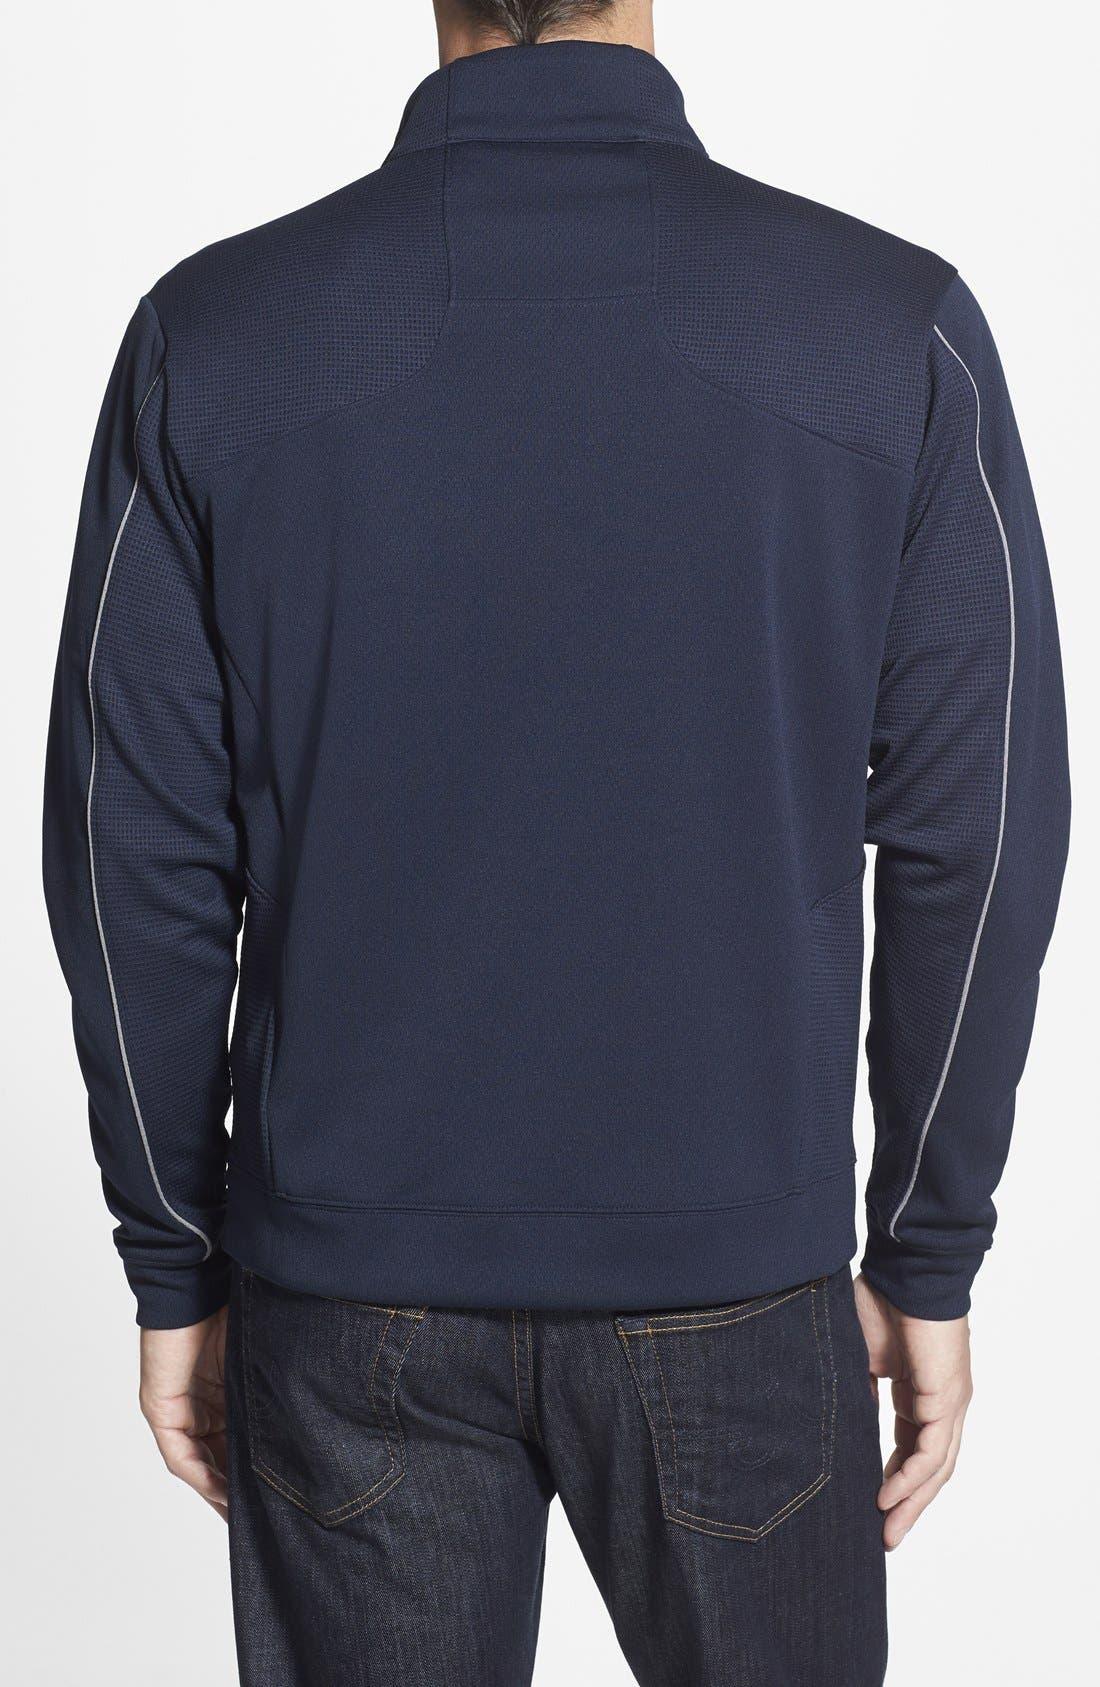 Alternate Image 2  - Cutter & Buck New York Giants - Edge DryTec Moisture Wicking Half Zip Pullover